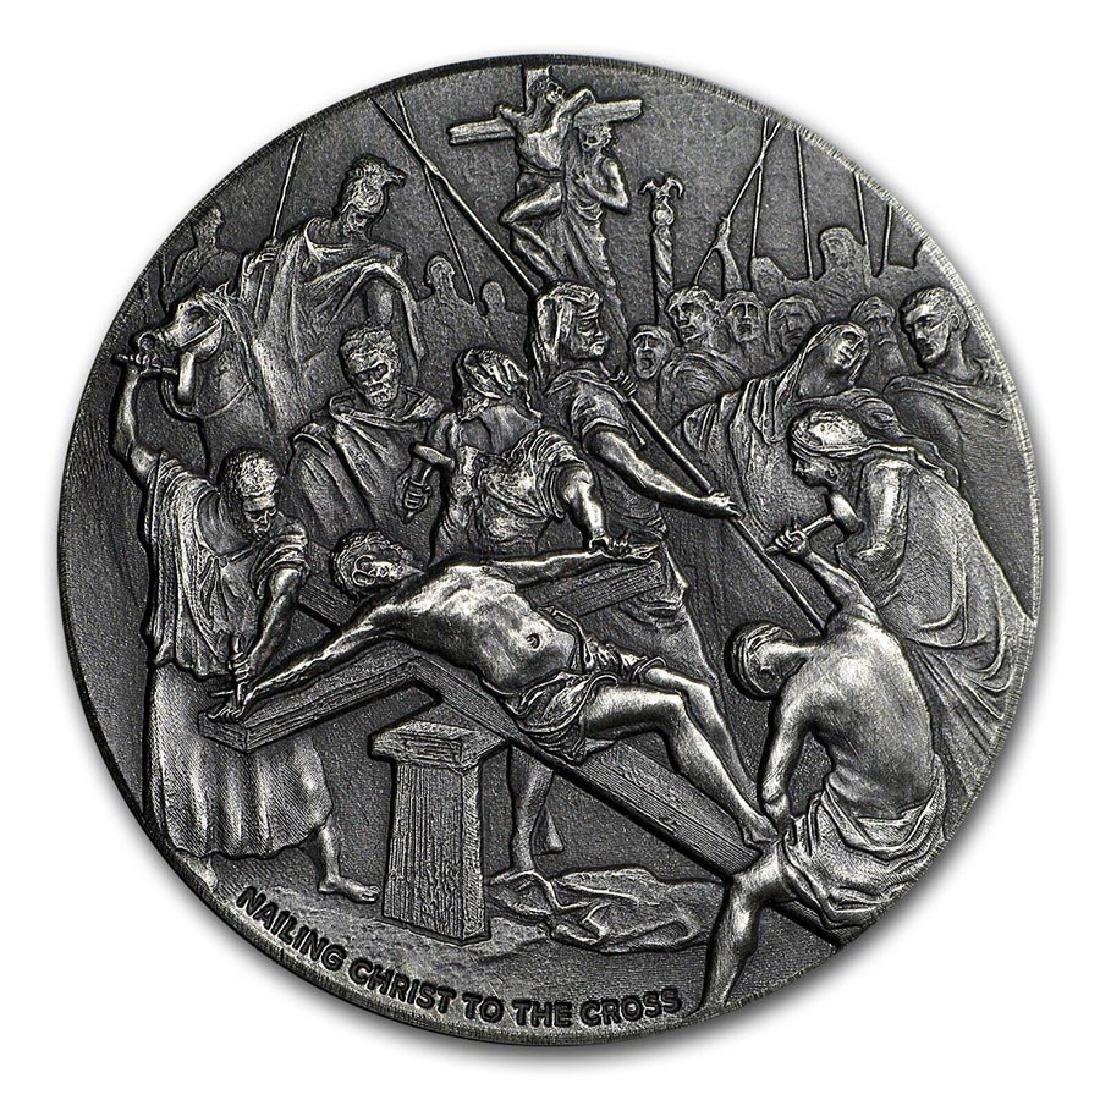 2017 2 oz Silver Coin - Biblical Series (Nailing Christ